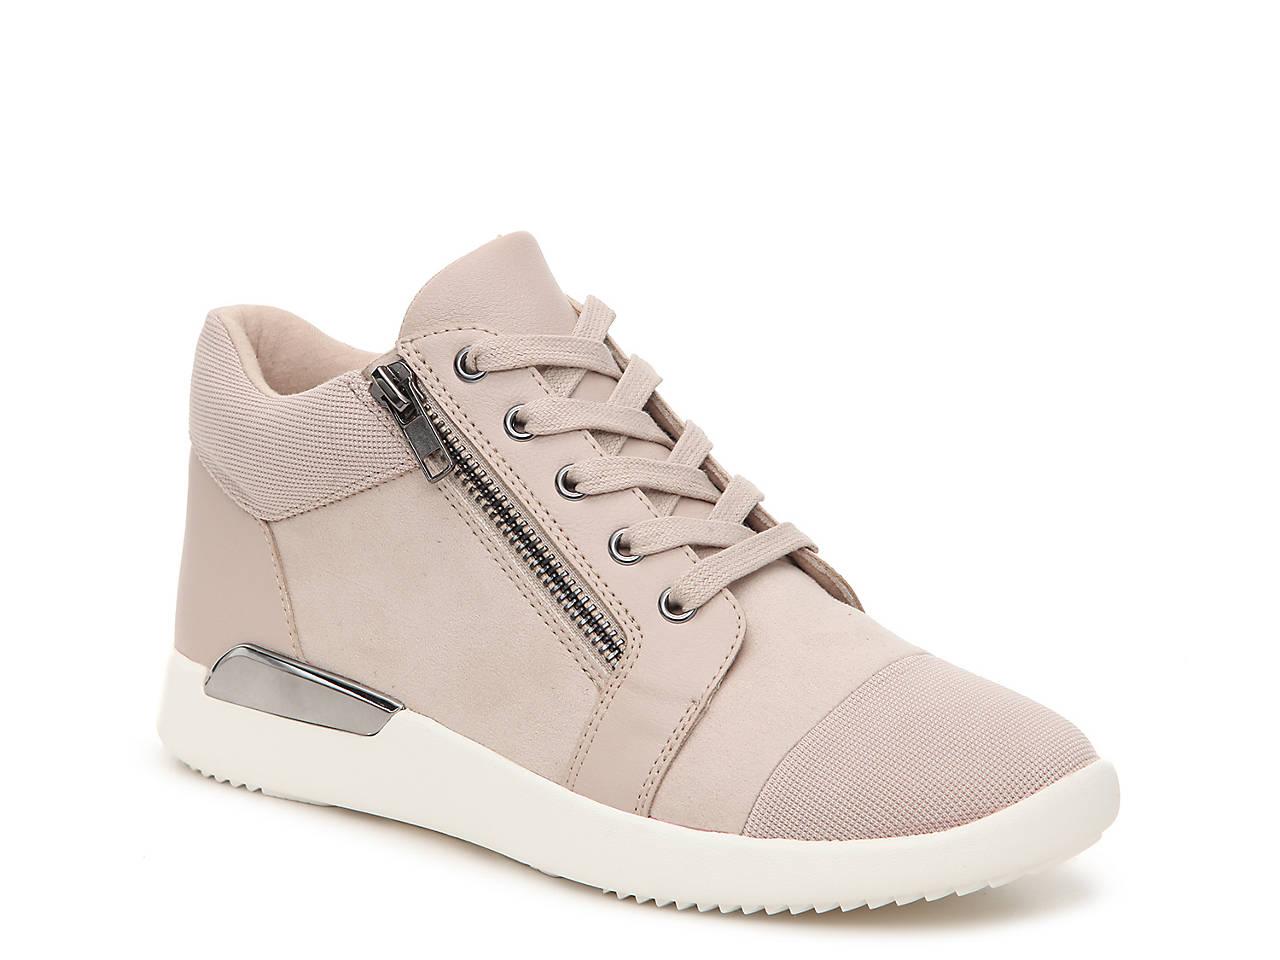 be96b3a80e5f Aldo Jahnsen Jogger High-Top Sneaker Women s Shoes